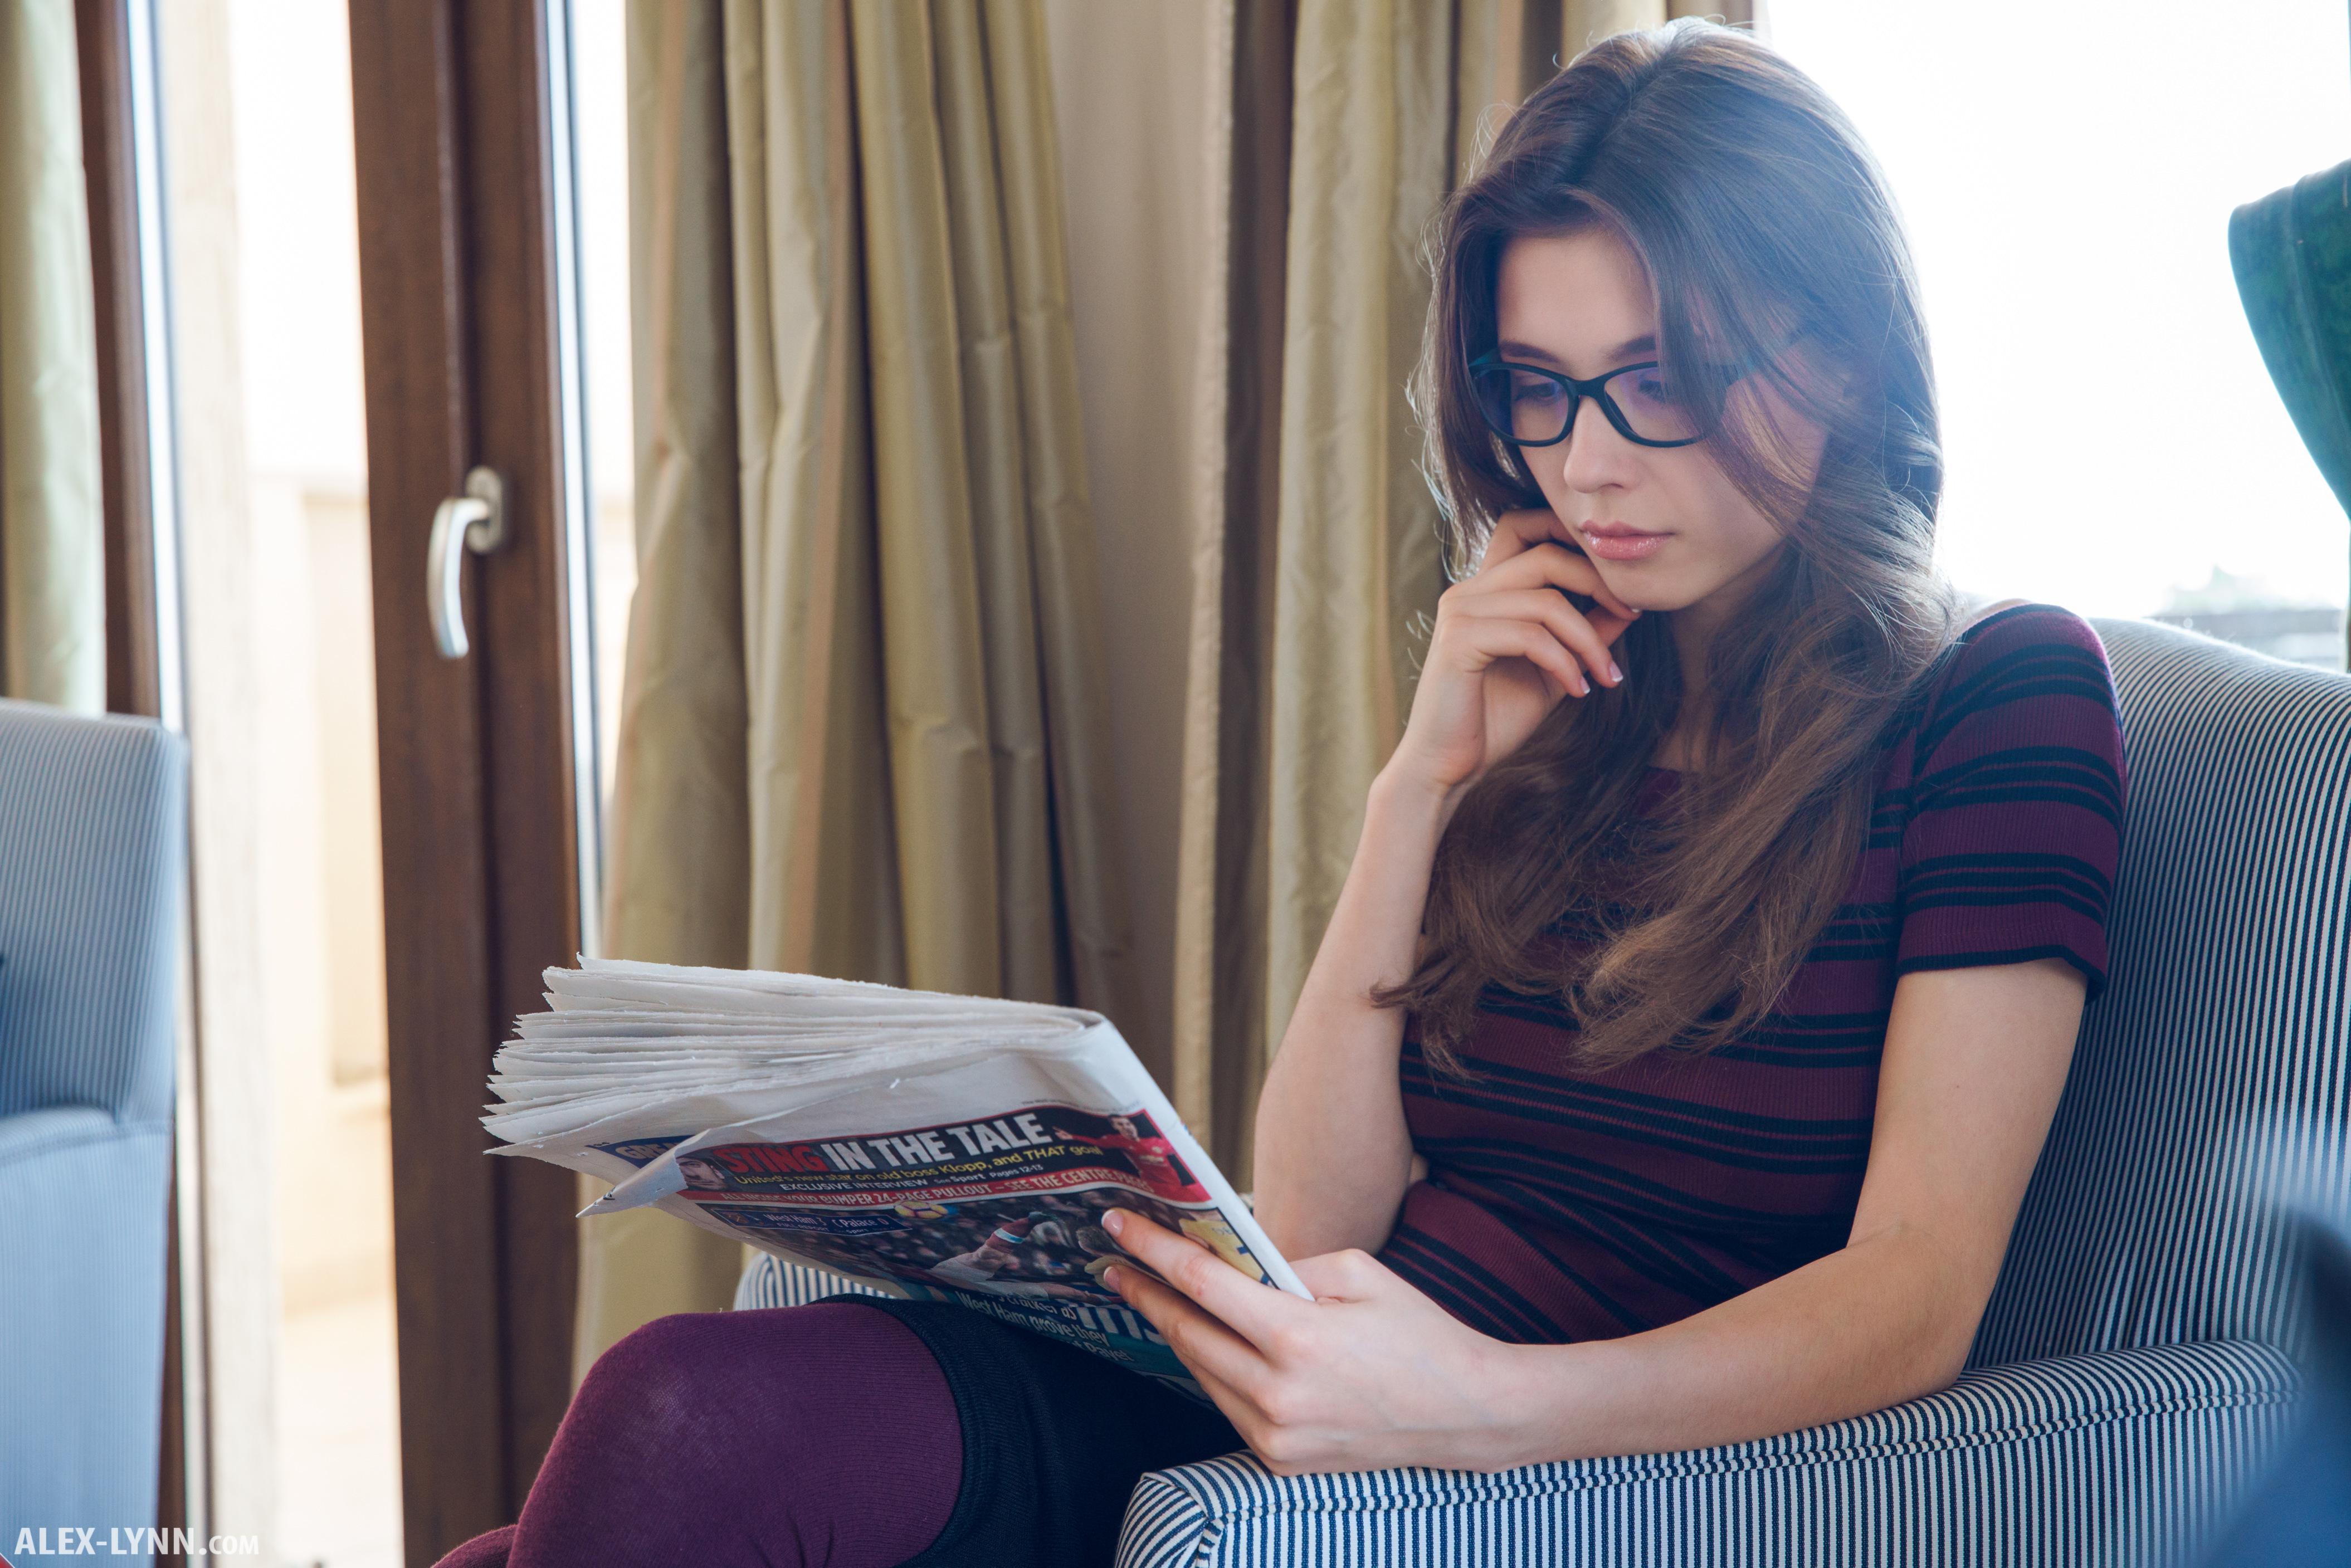 People 4220x2815 Mila Azul model stockings glasses ekaterina volkova Alex Lynn Alex-Lynn.com reading